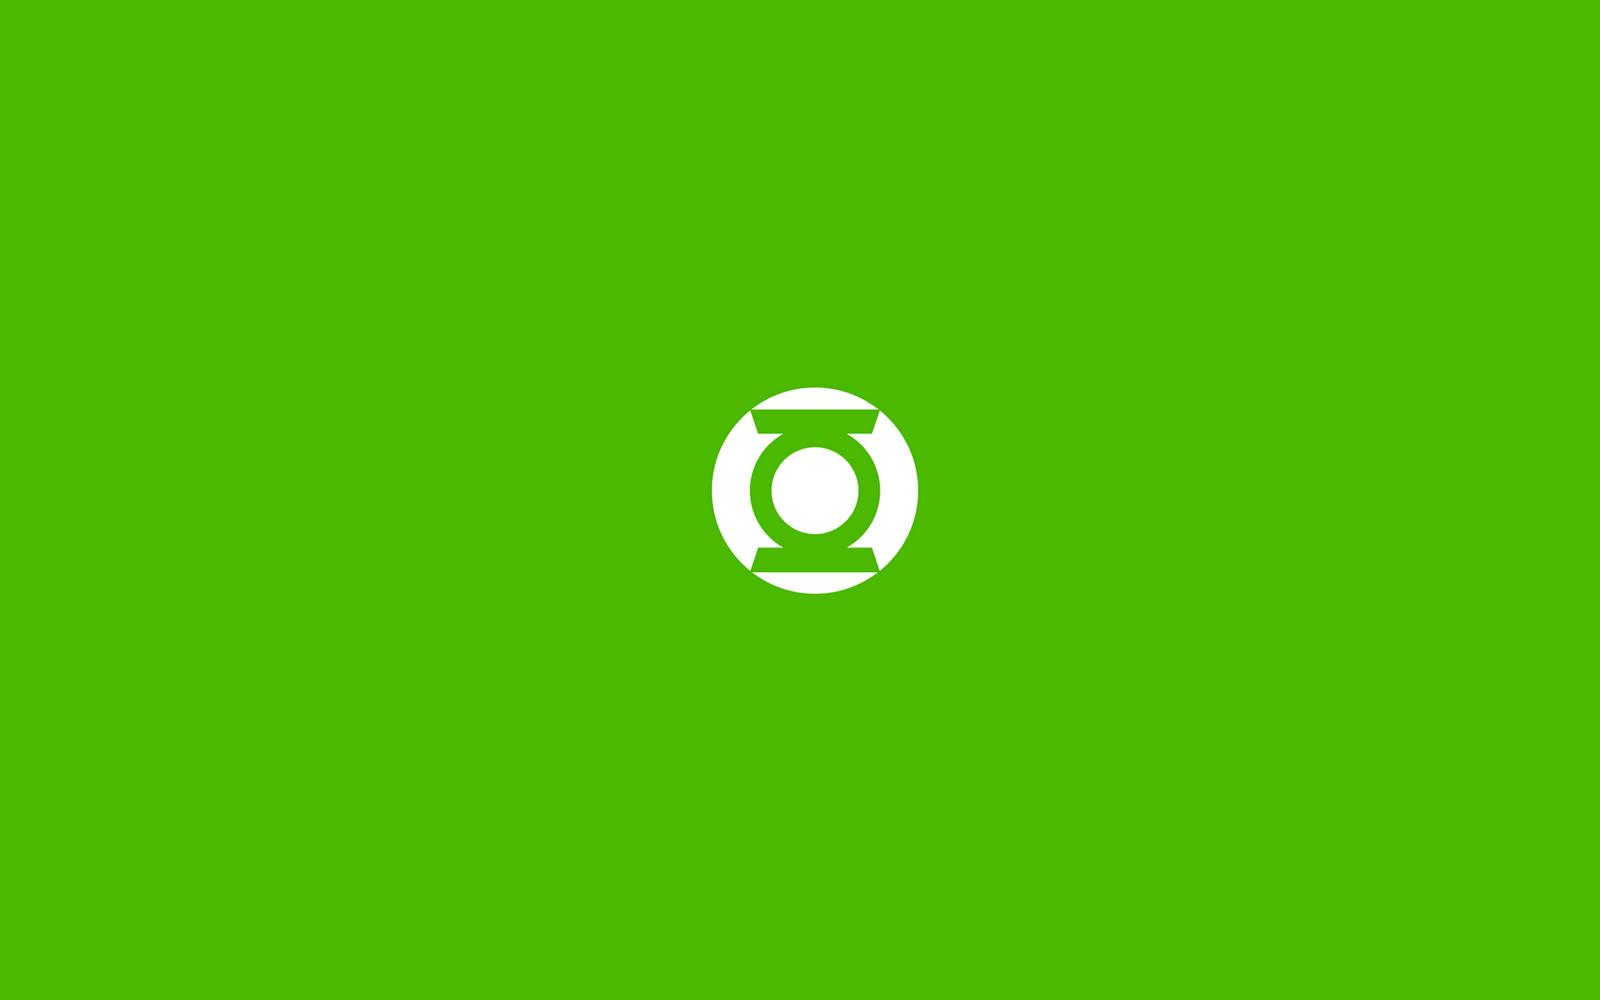 Green Lantern Comics Logo Minimal HD Wallpapers HQ